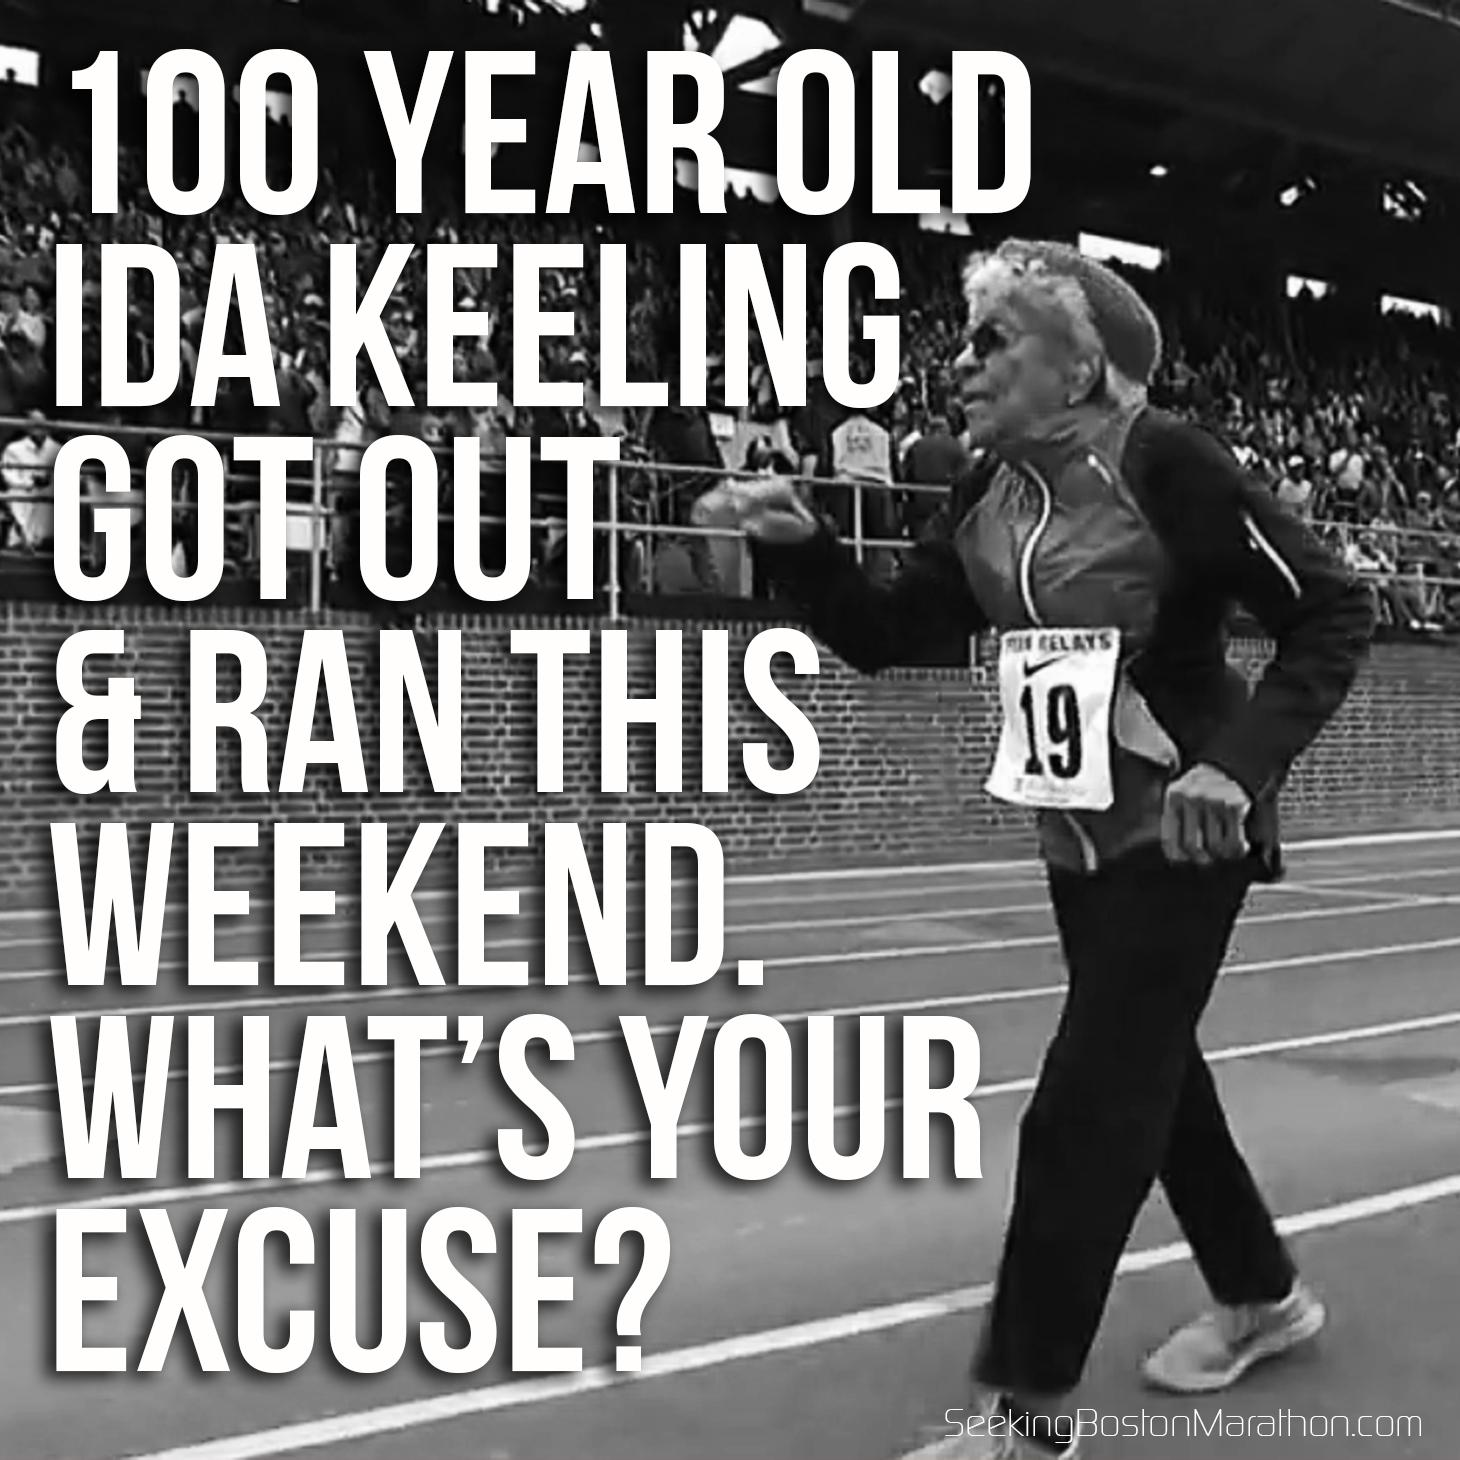 Meme Motivation Monday: Ida Rocks at 100